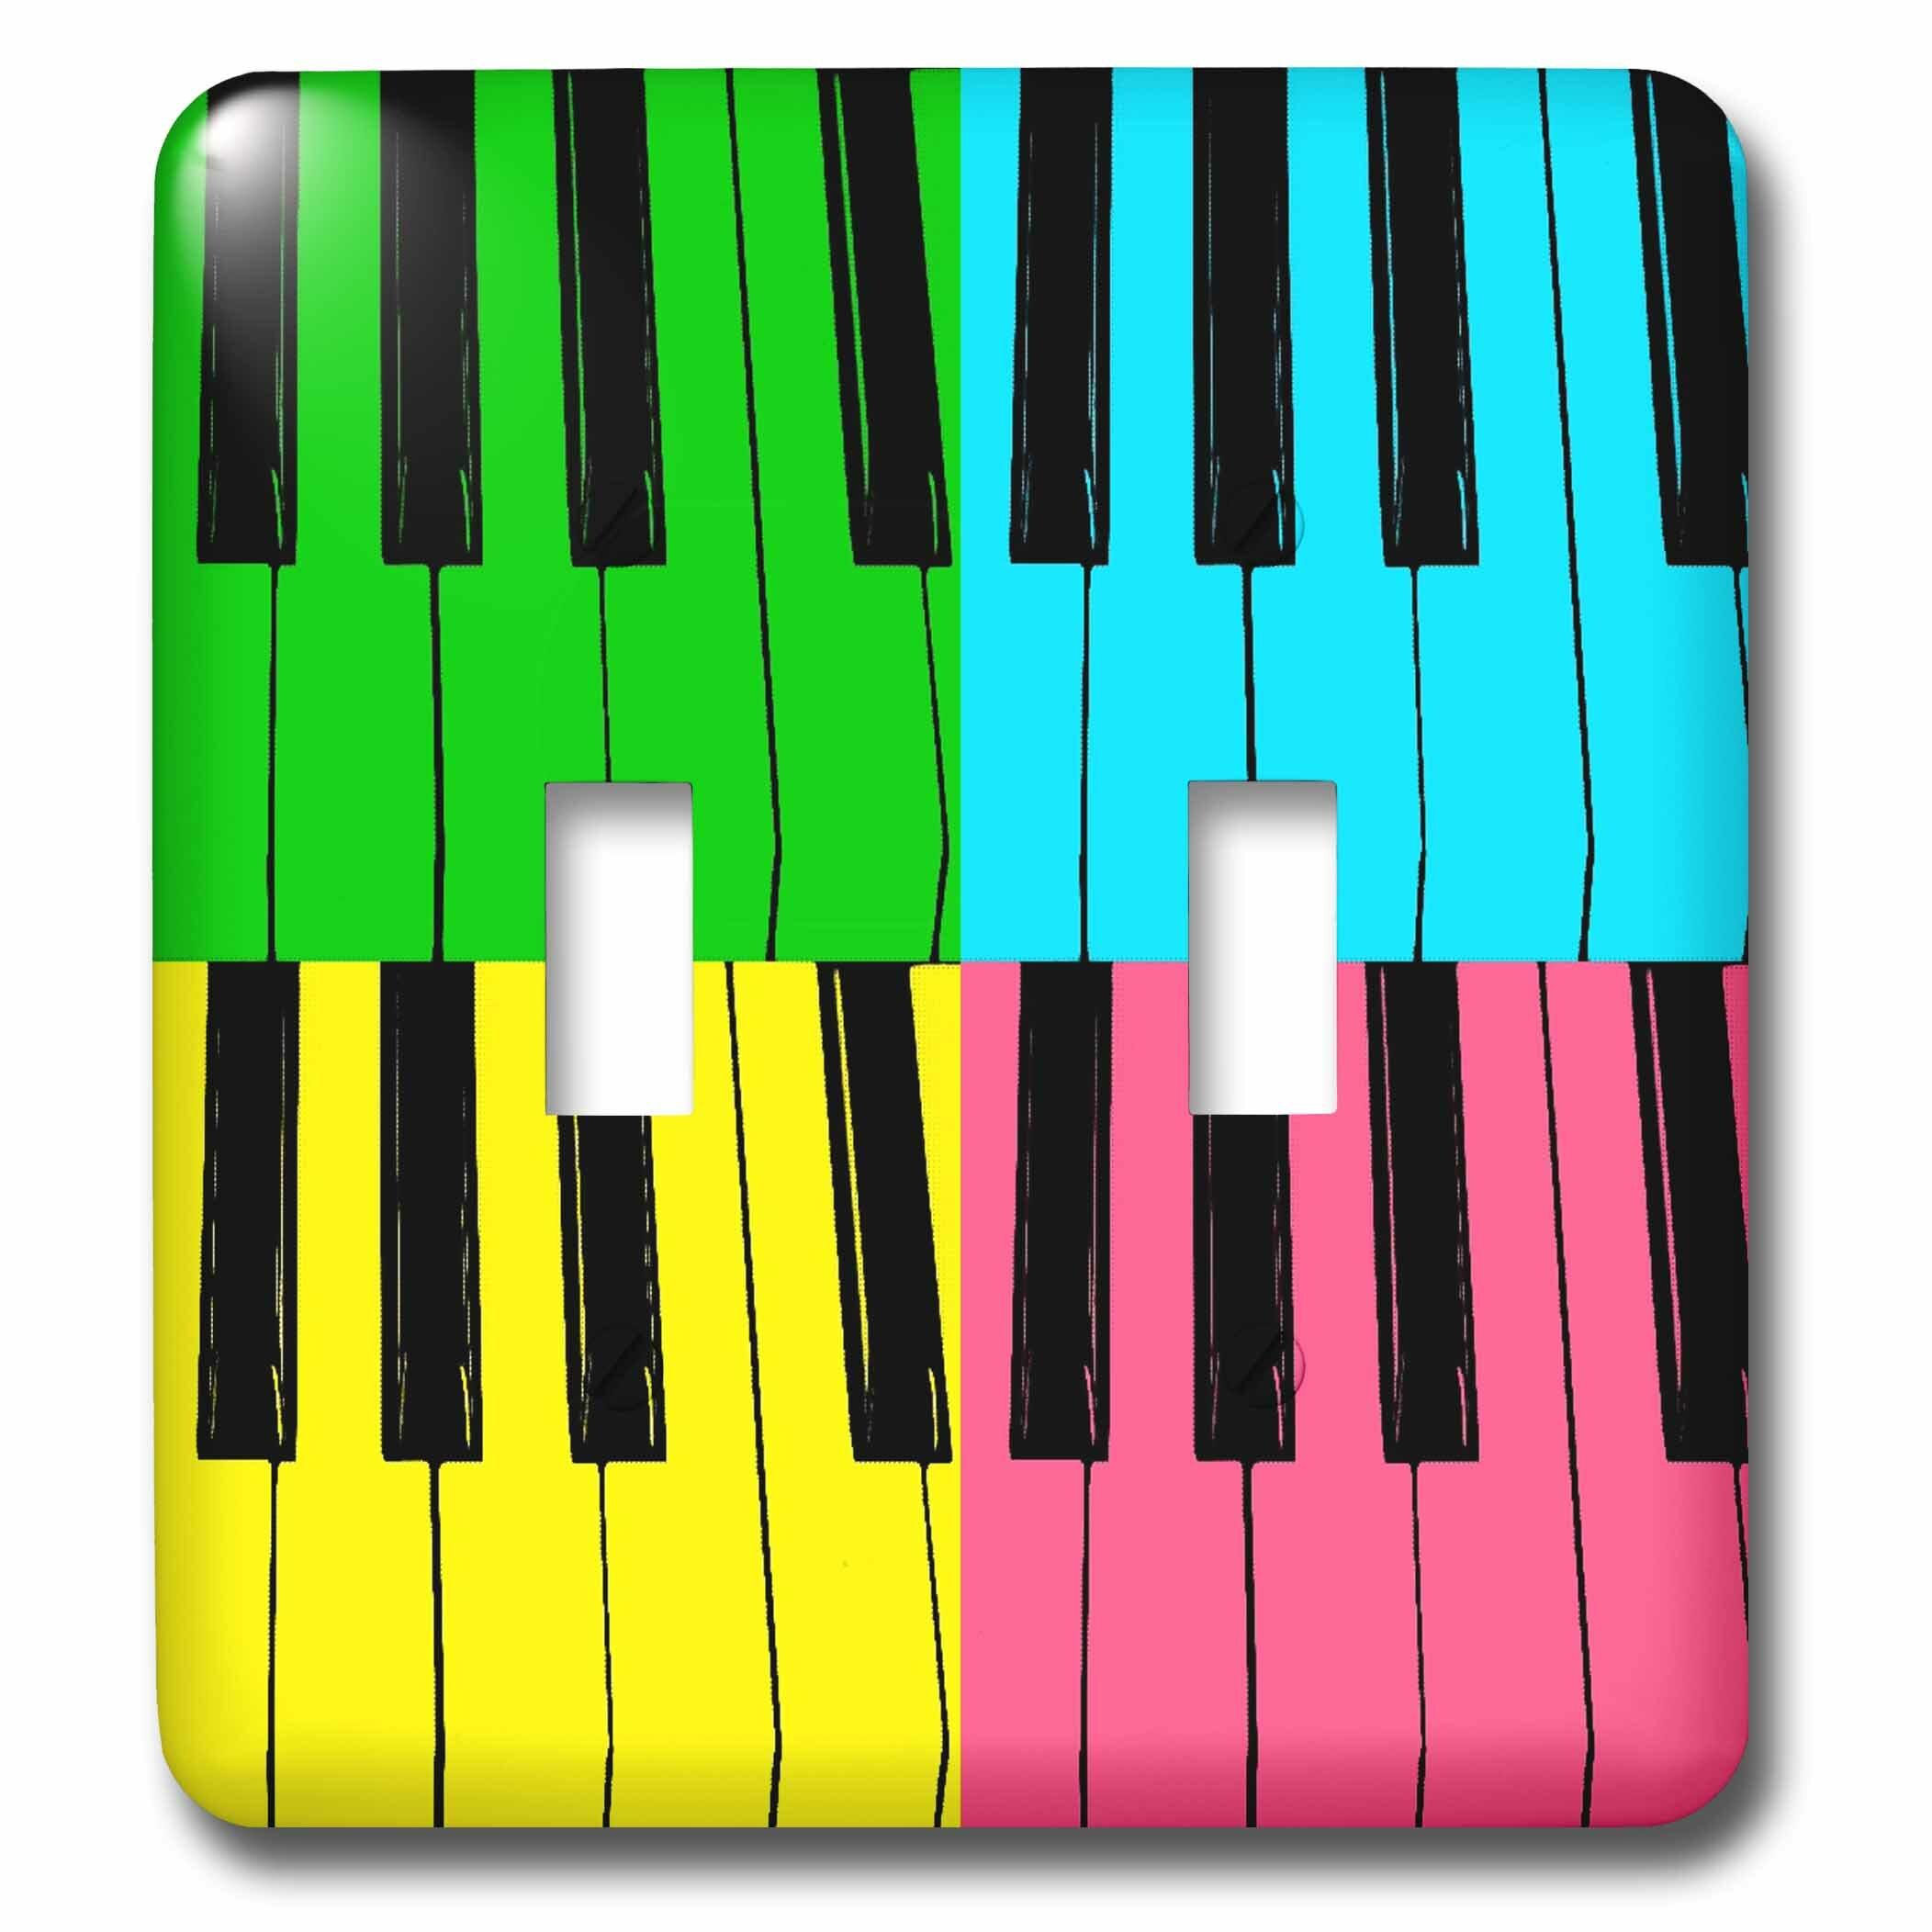 3drose Fun Piano Keys 2 Gang Toggle Light Switch Wall Plate Wayfair